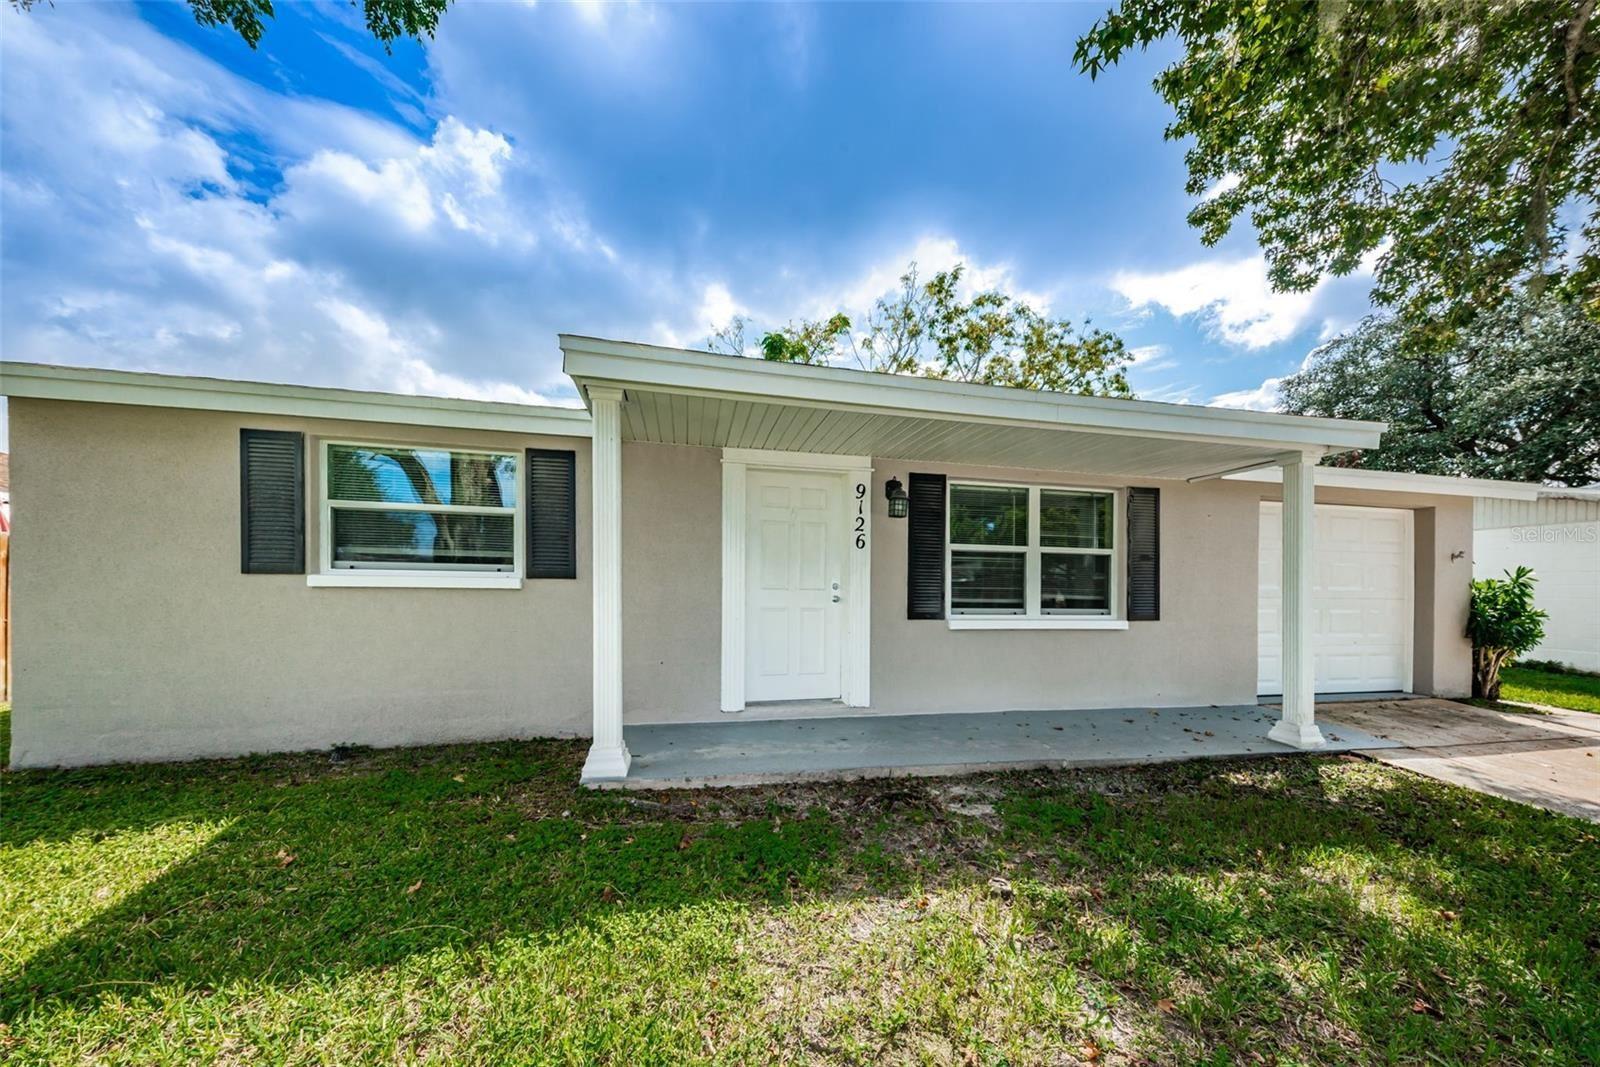 9126 CHANTILLY LANE, Port Richey, FL 34668 - #: W7838179